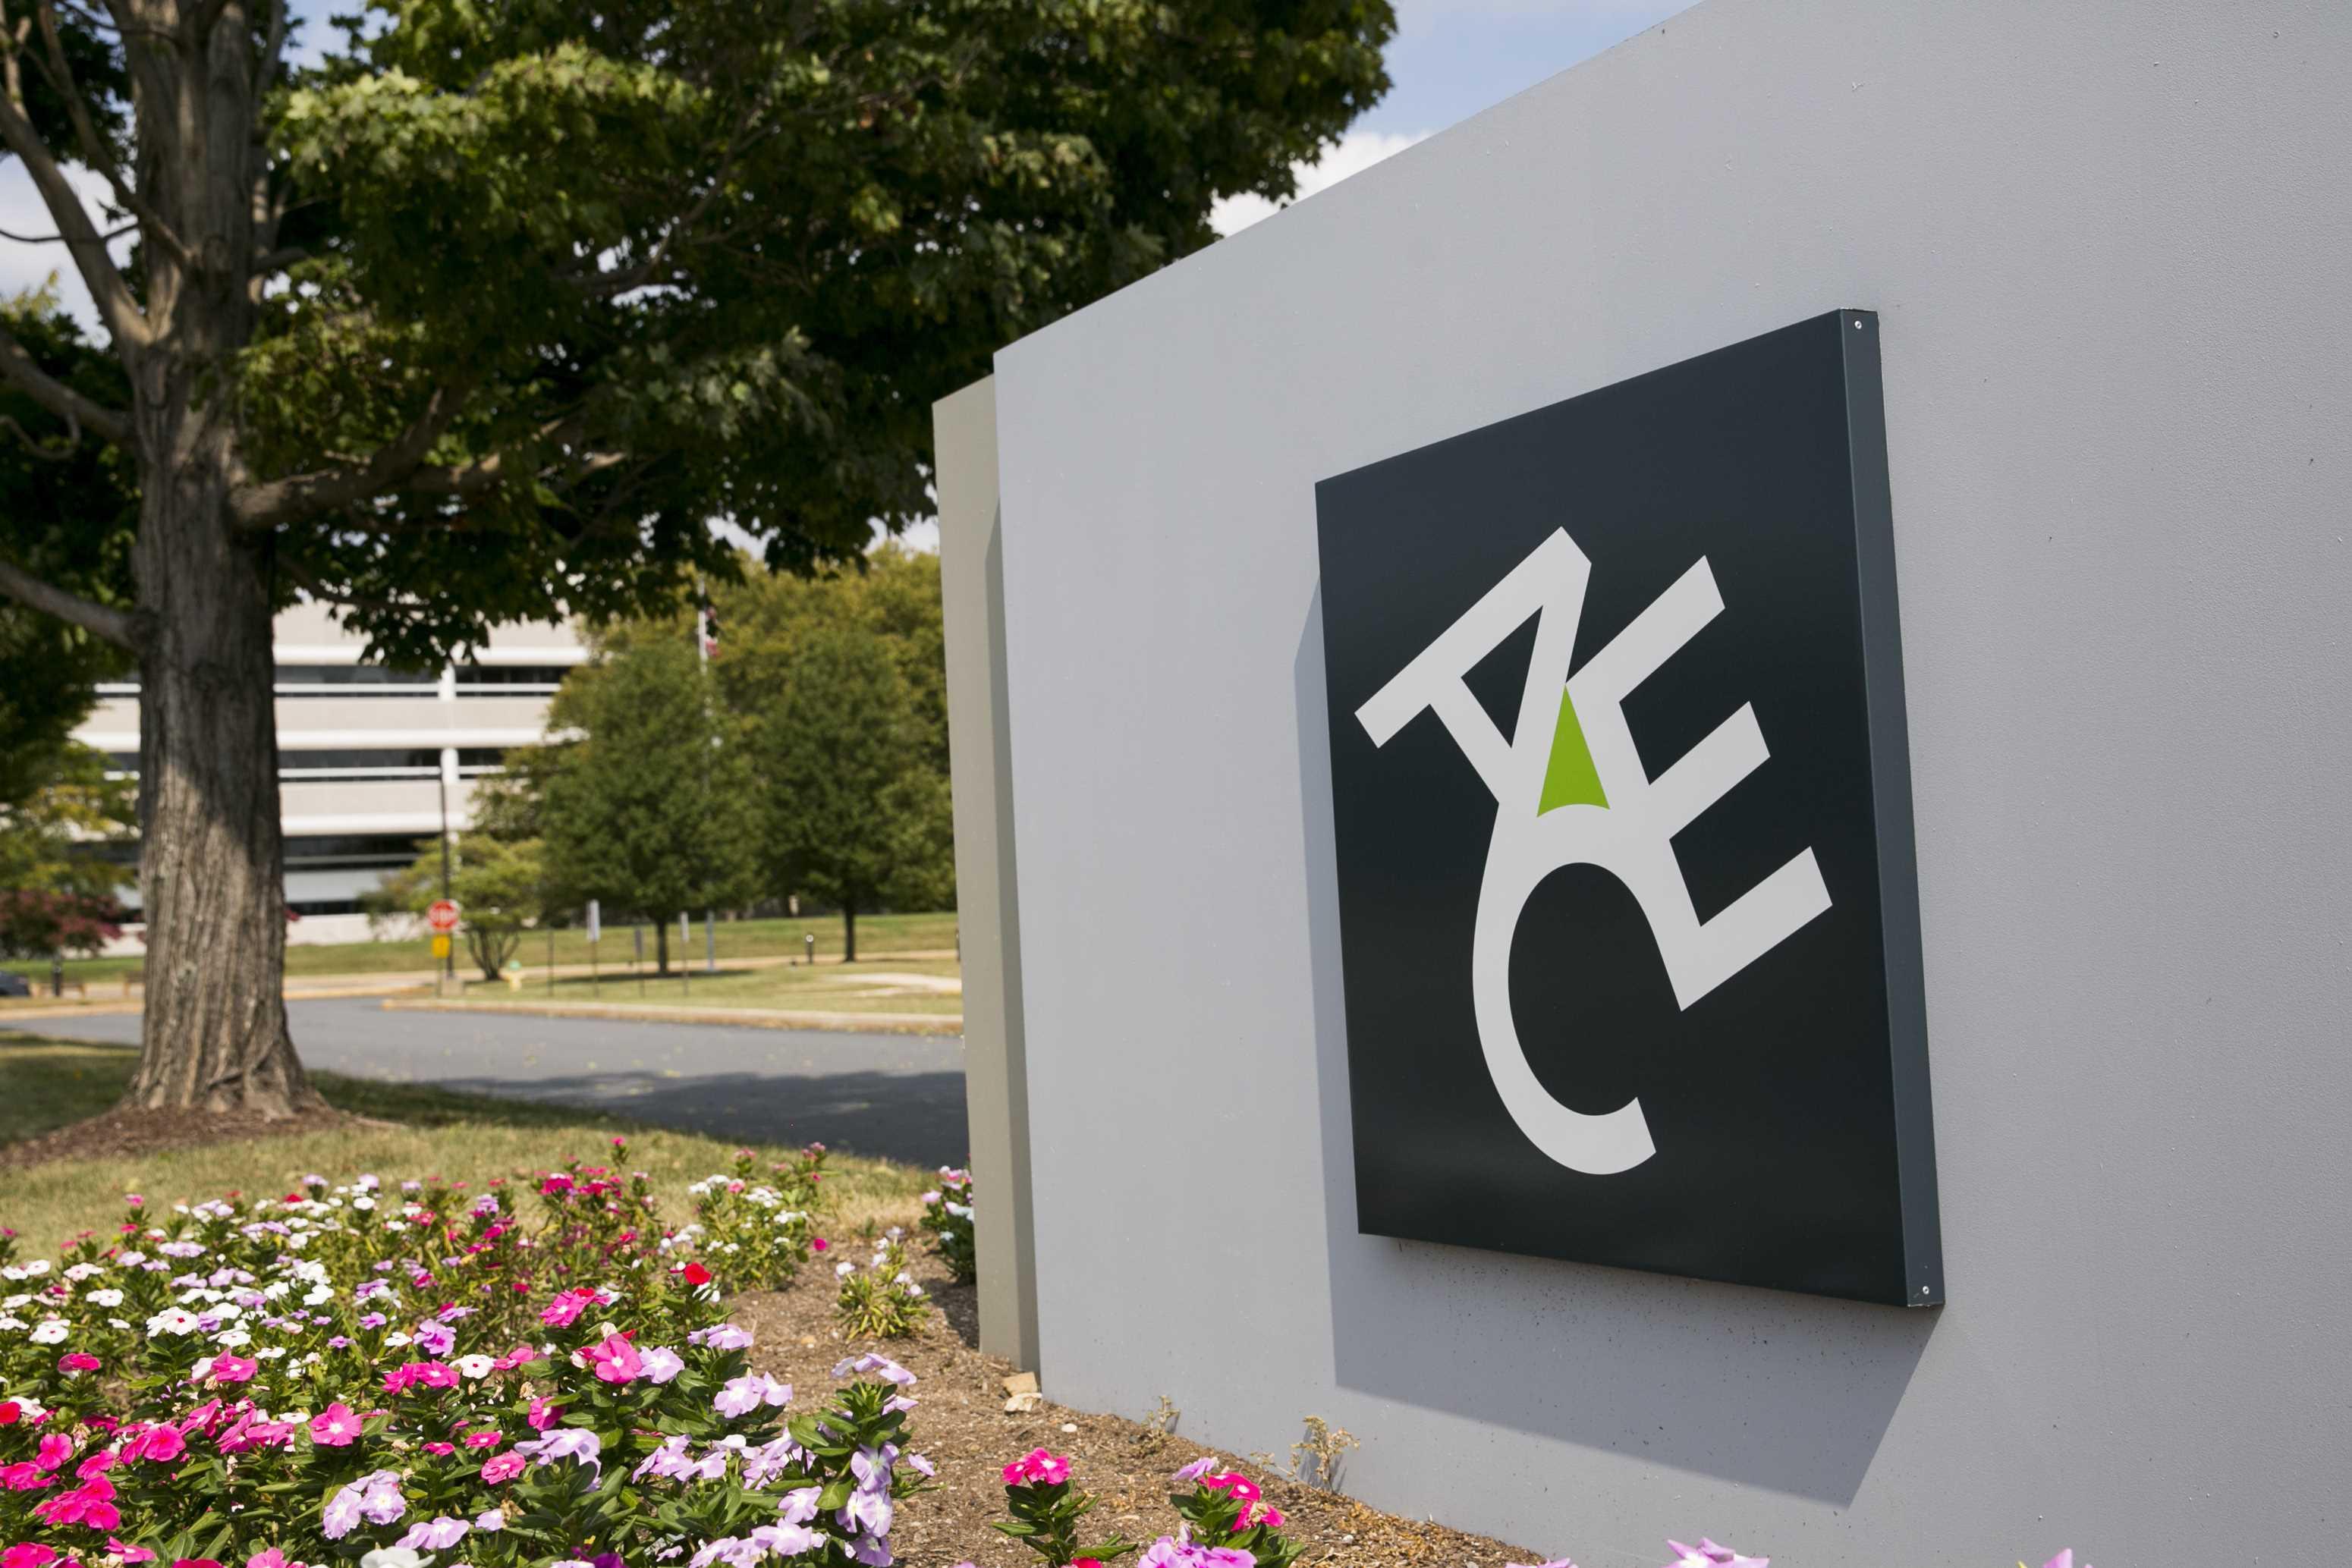 Ace Group announces $5.3 billion bond to fund Chubb buy